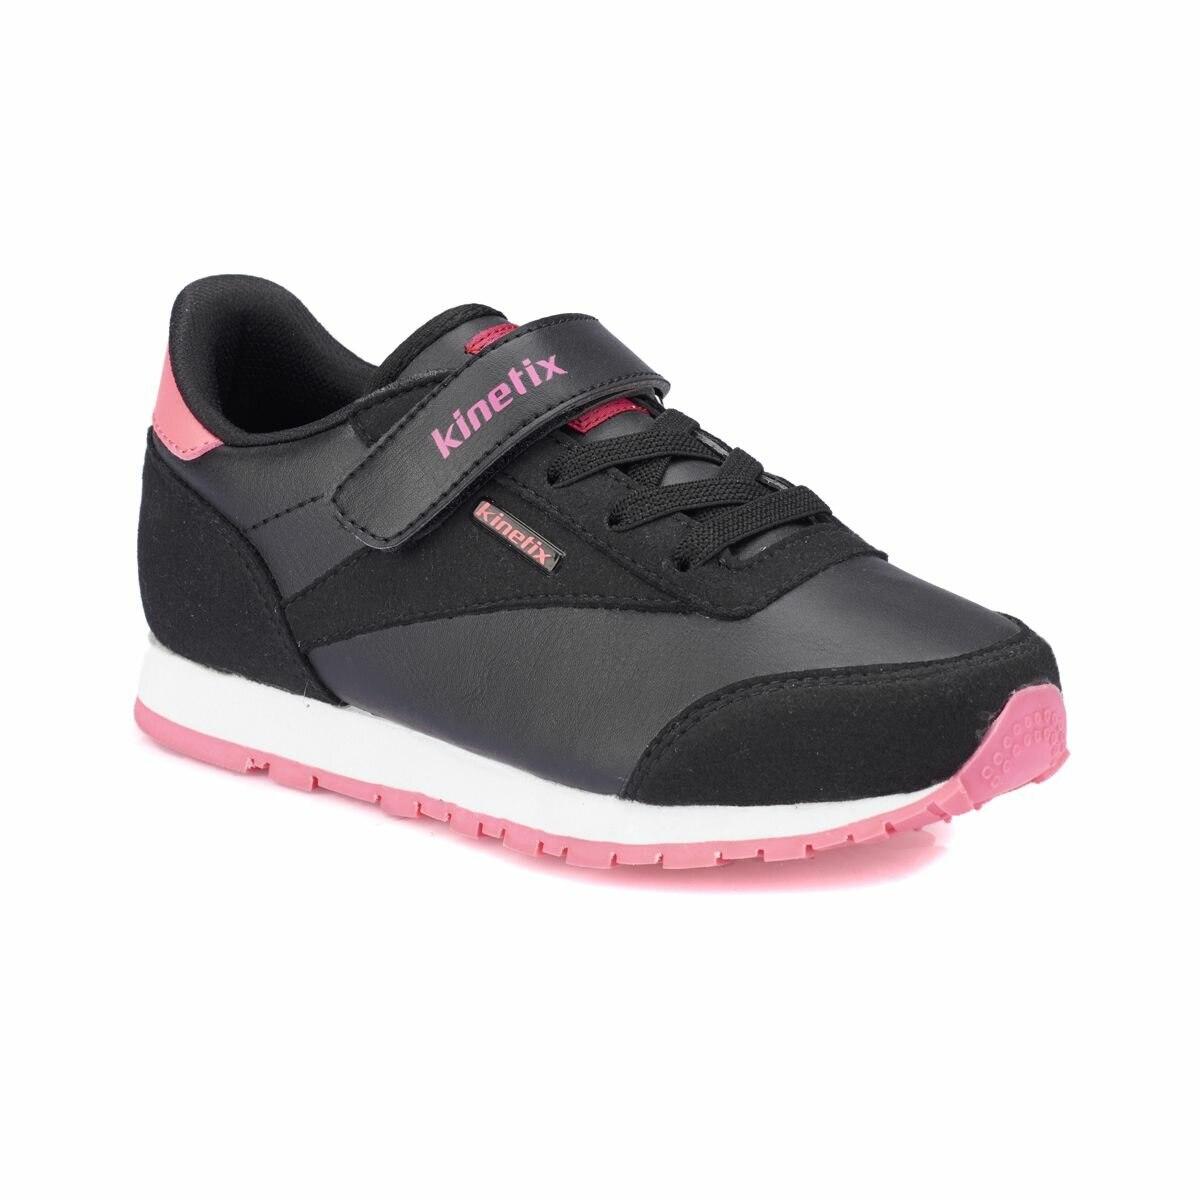 FLO AFLON Gray Female Child Running Shoes KINETIX